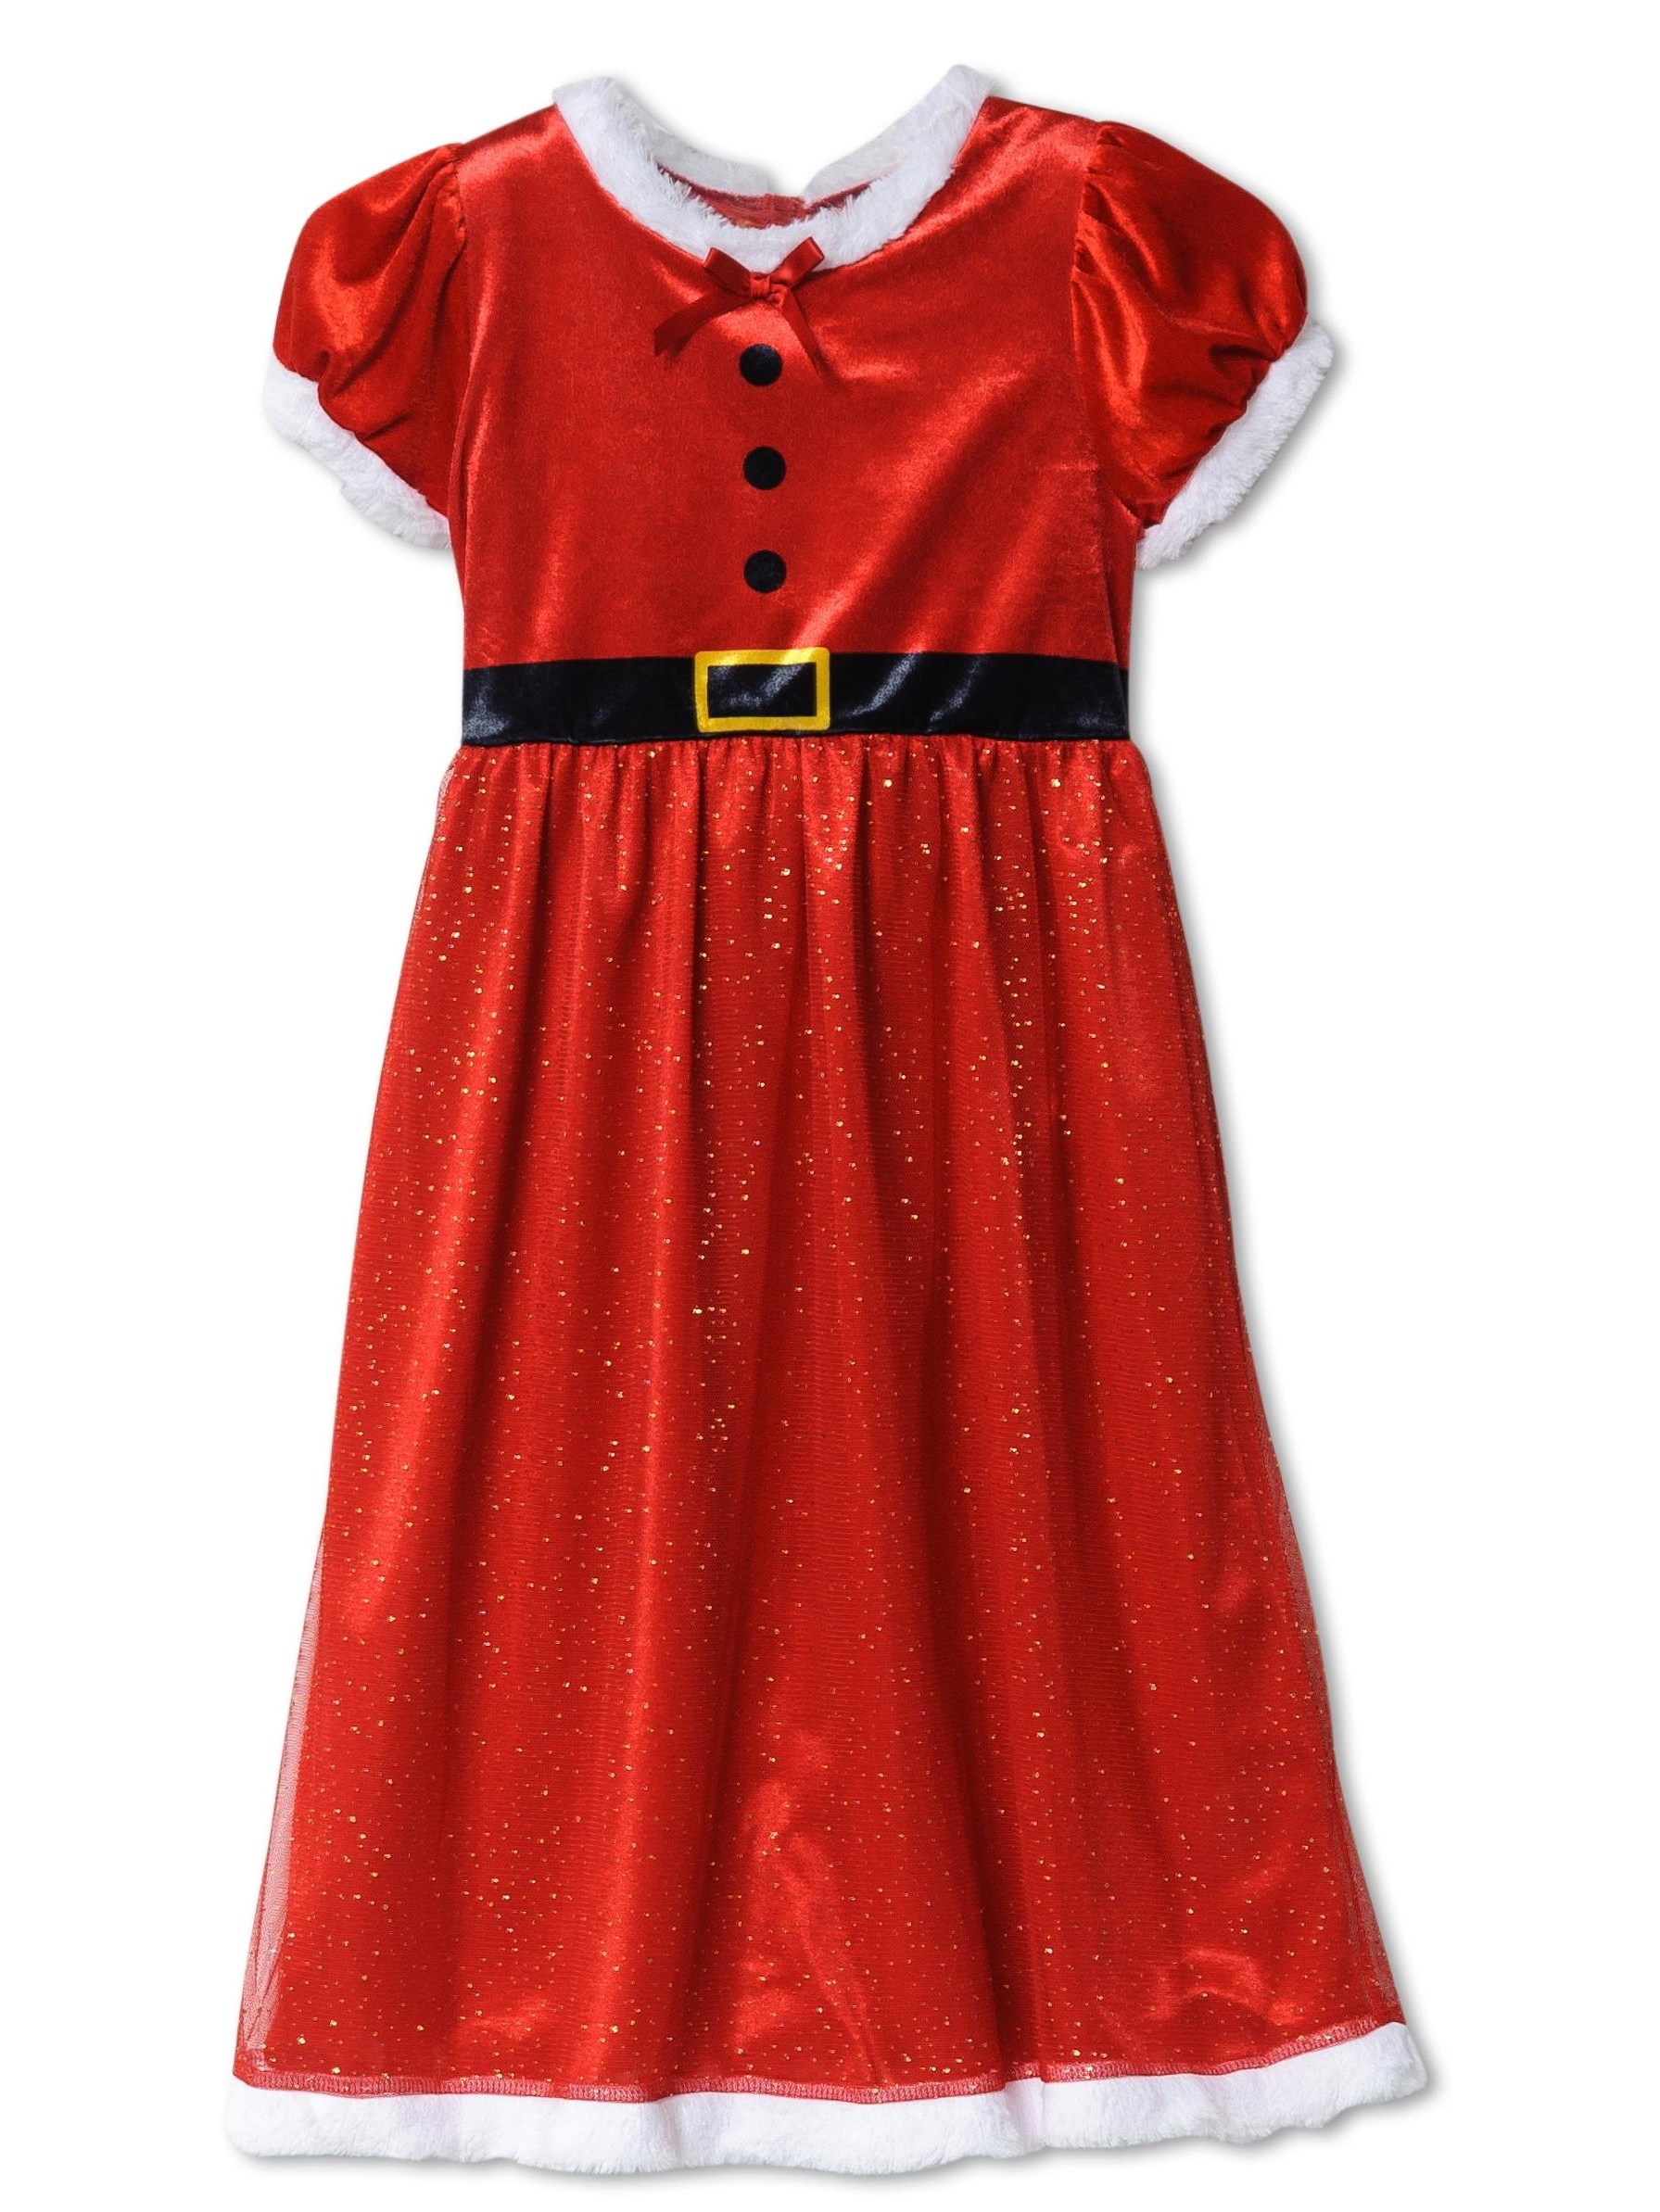 Princess Dream Girl Red Santa Glittery Nightgown Long Night Gown Nightie